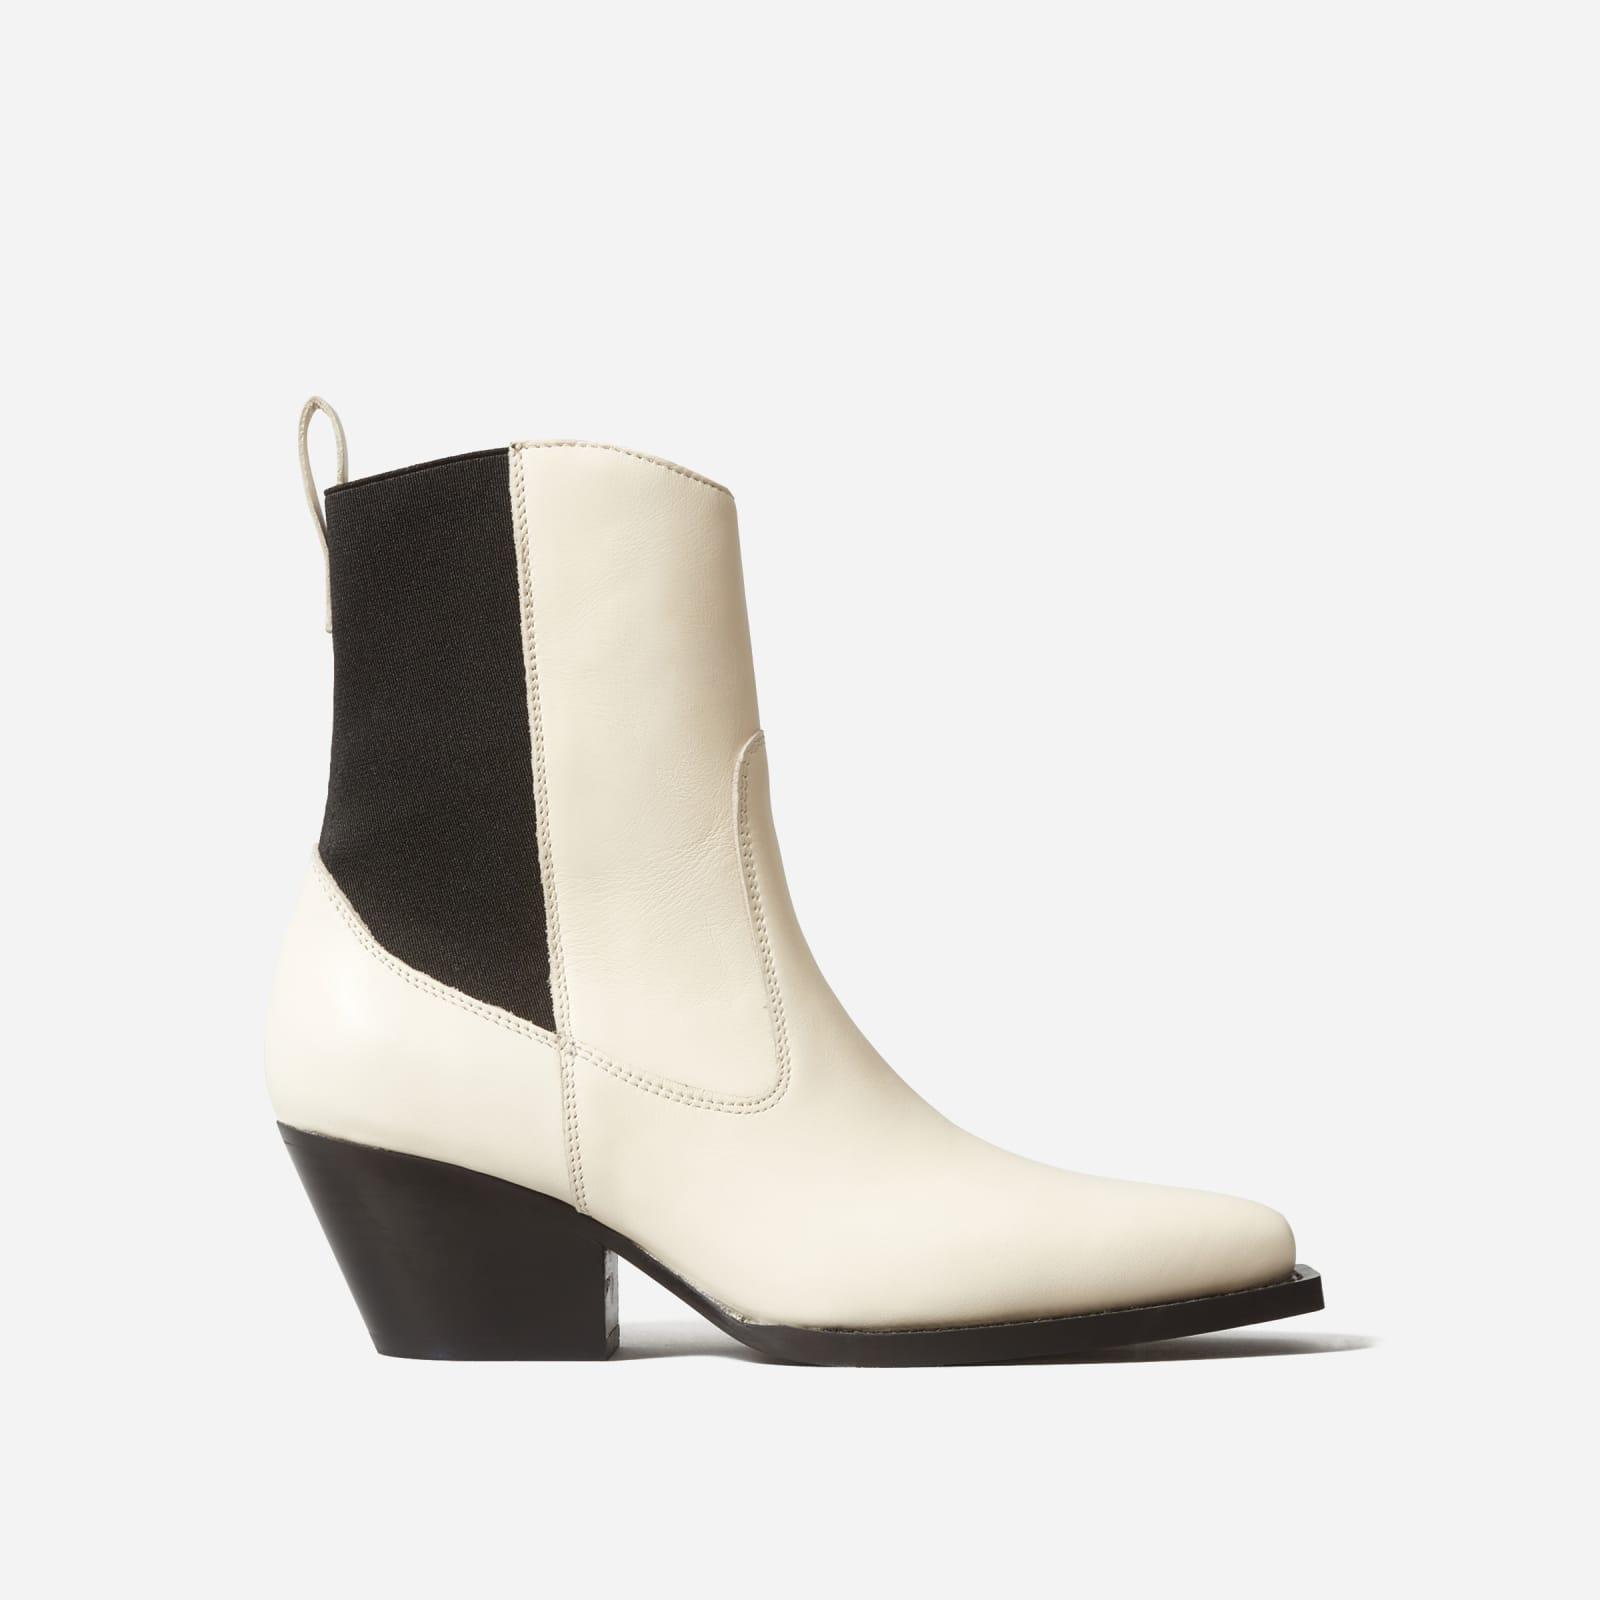 wild western boot by everlane in bone, size 5